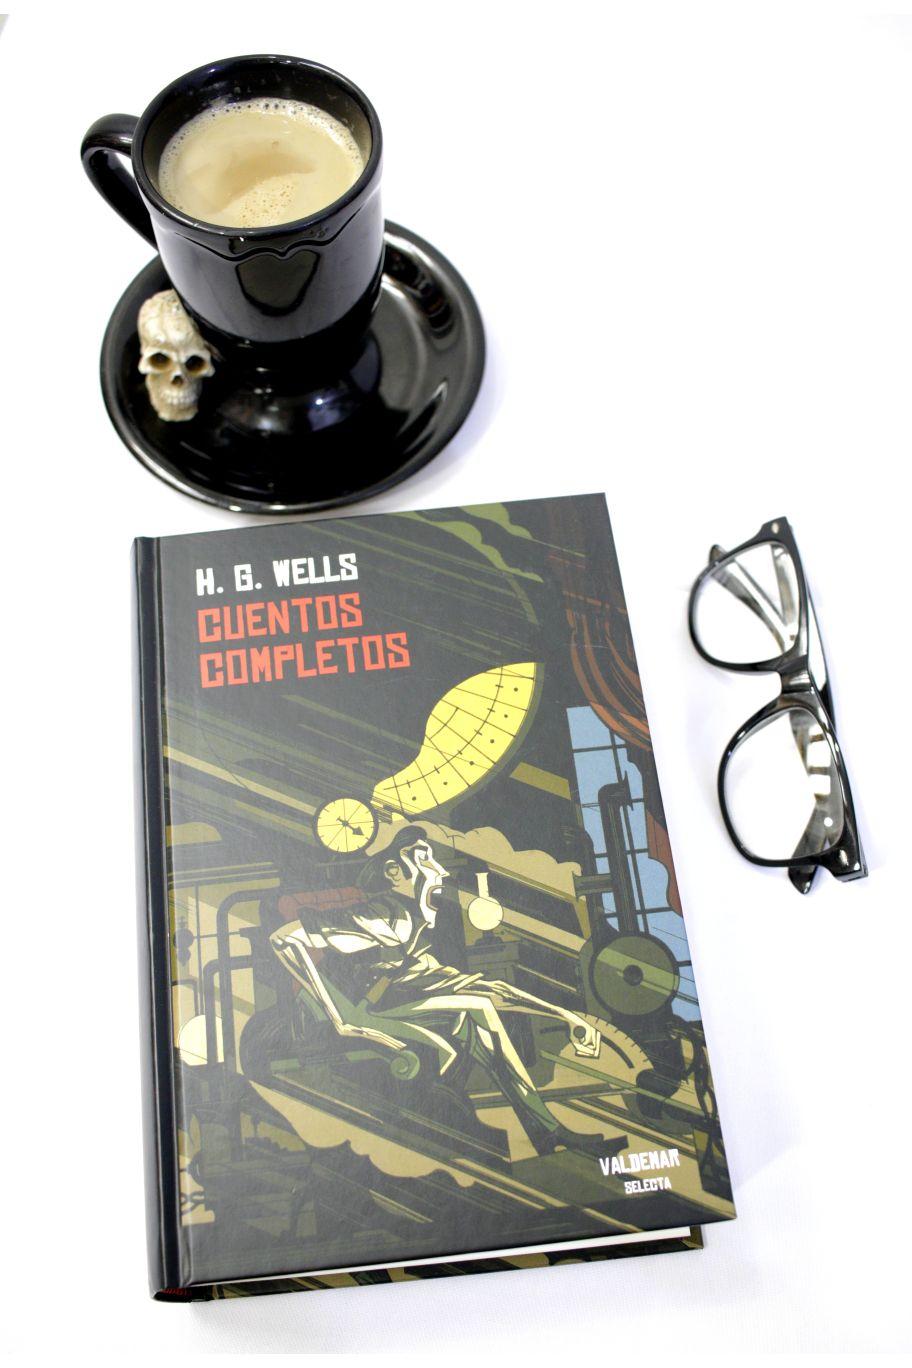 CUENTOS COMPLETOS, N.B. WELLS